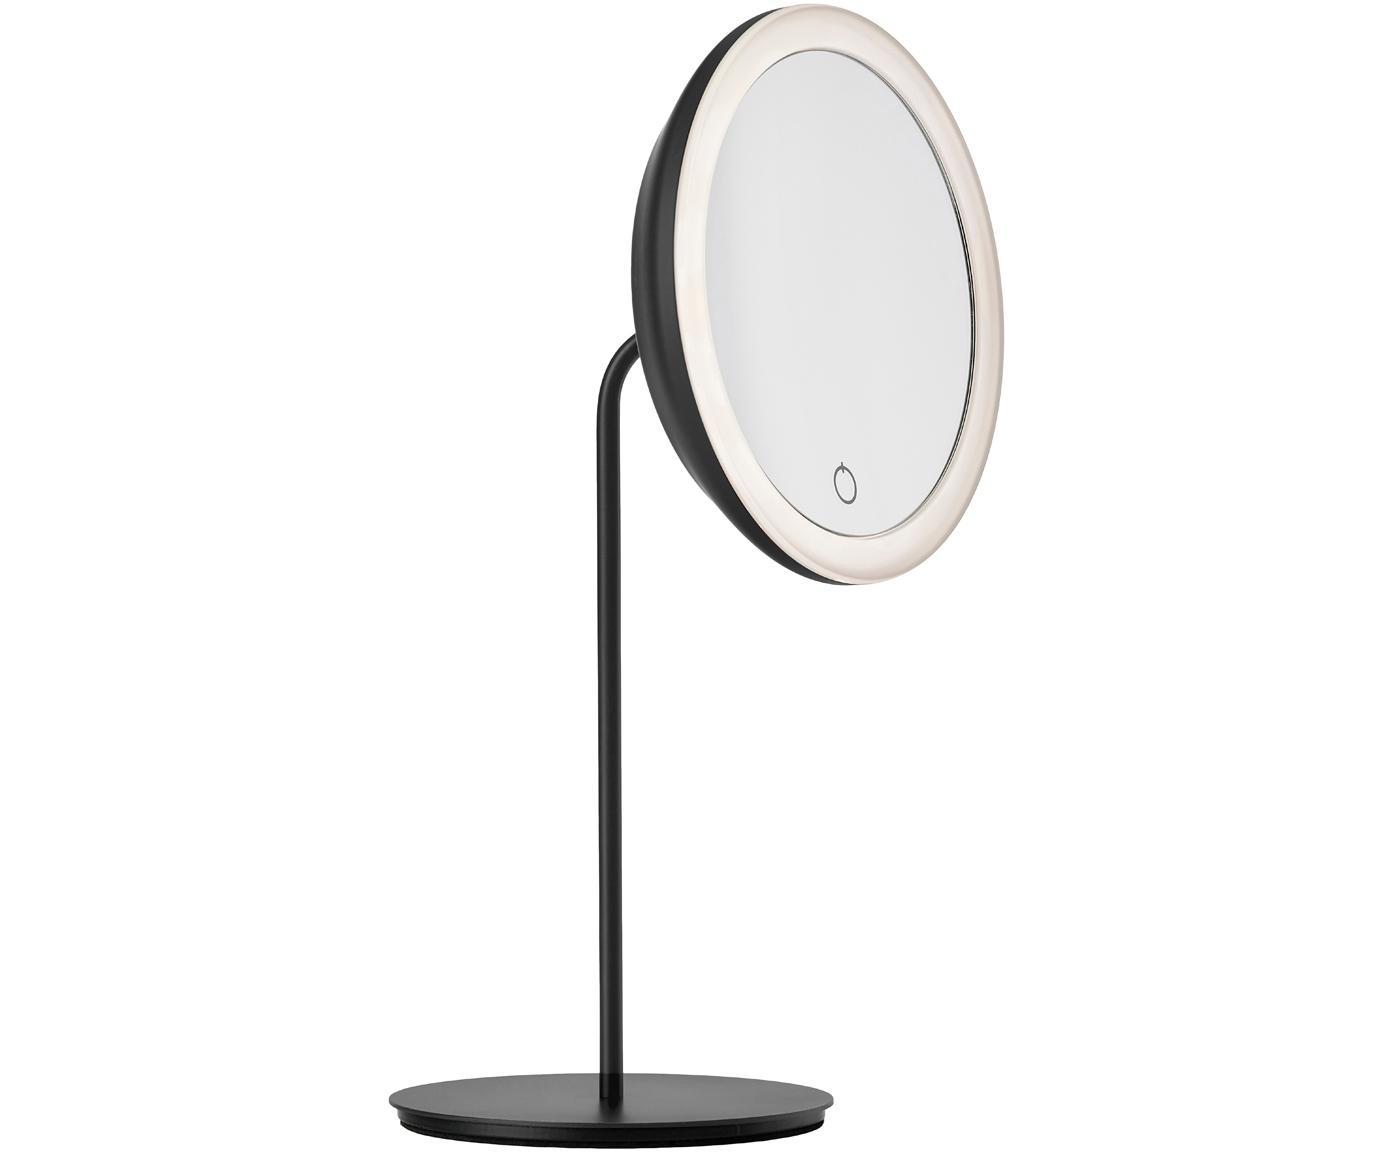 Specchio cosmetico Maguna, Metallo, Nero, Larg. 18 x Alt. 34 cm